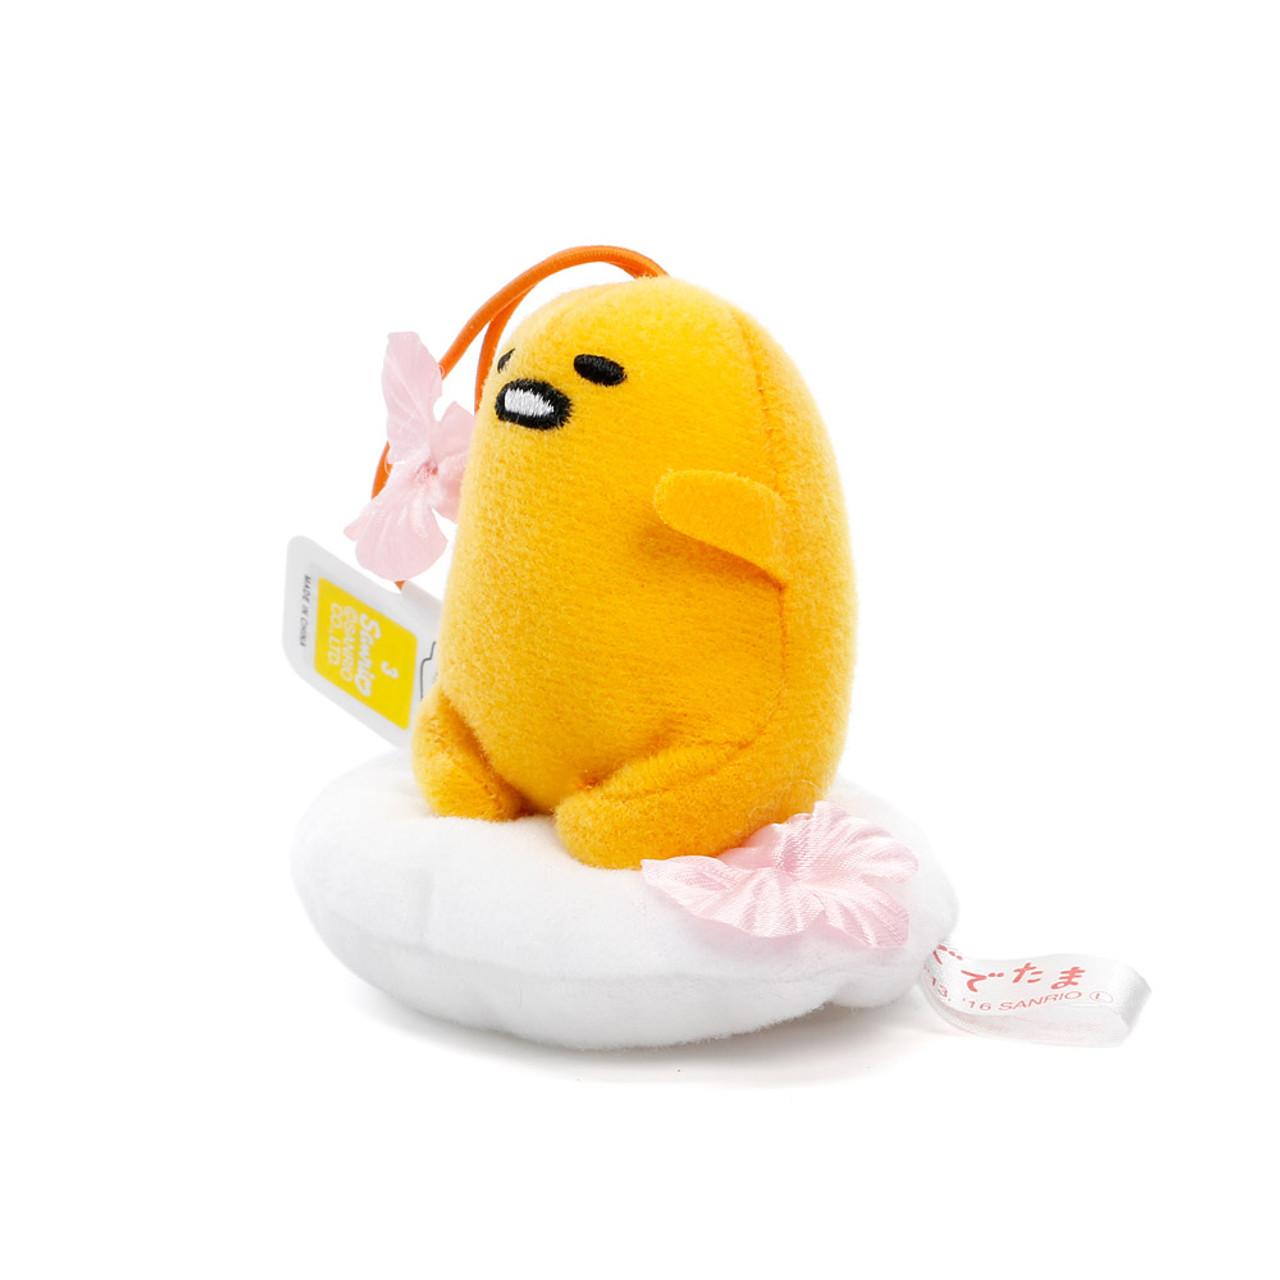 Sanrio Gudetama Lazy Egg Sakura Mascot Plush Charms - Sitting On Sakura Egg White ( Side View )